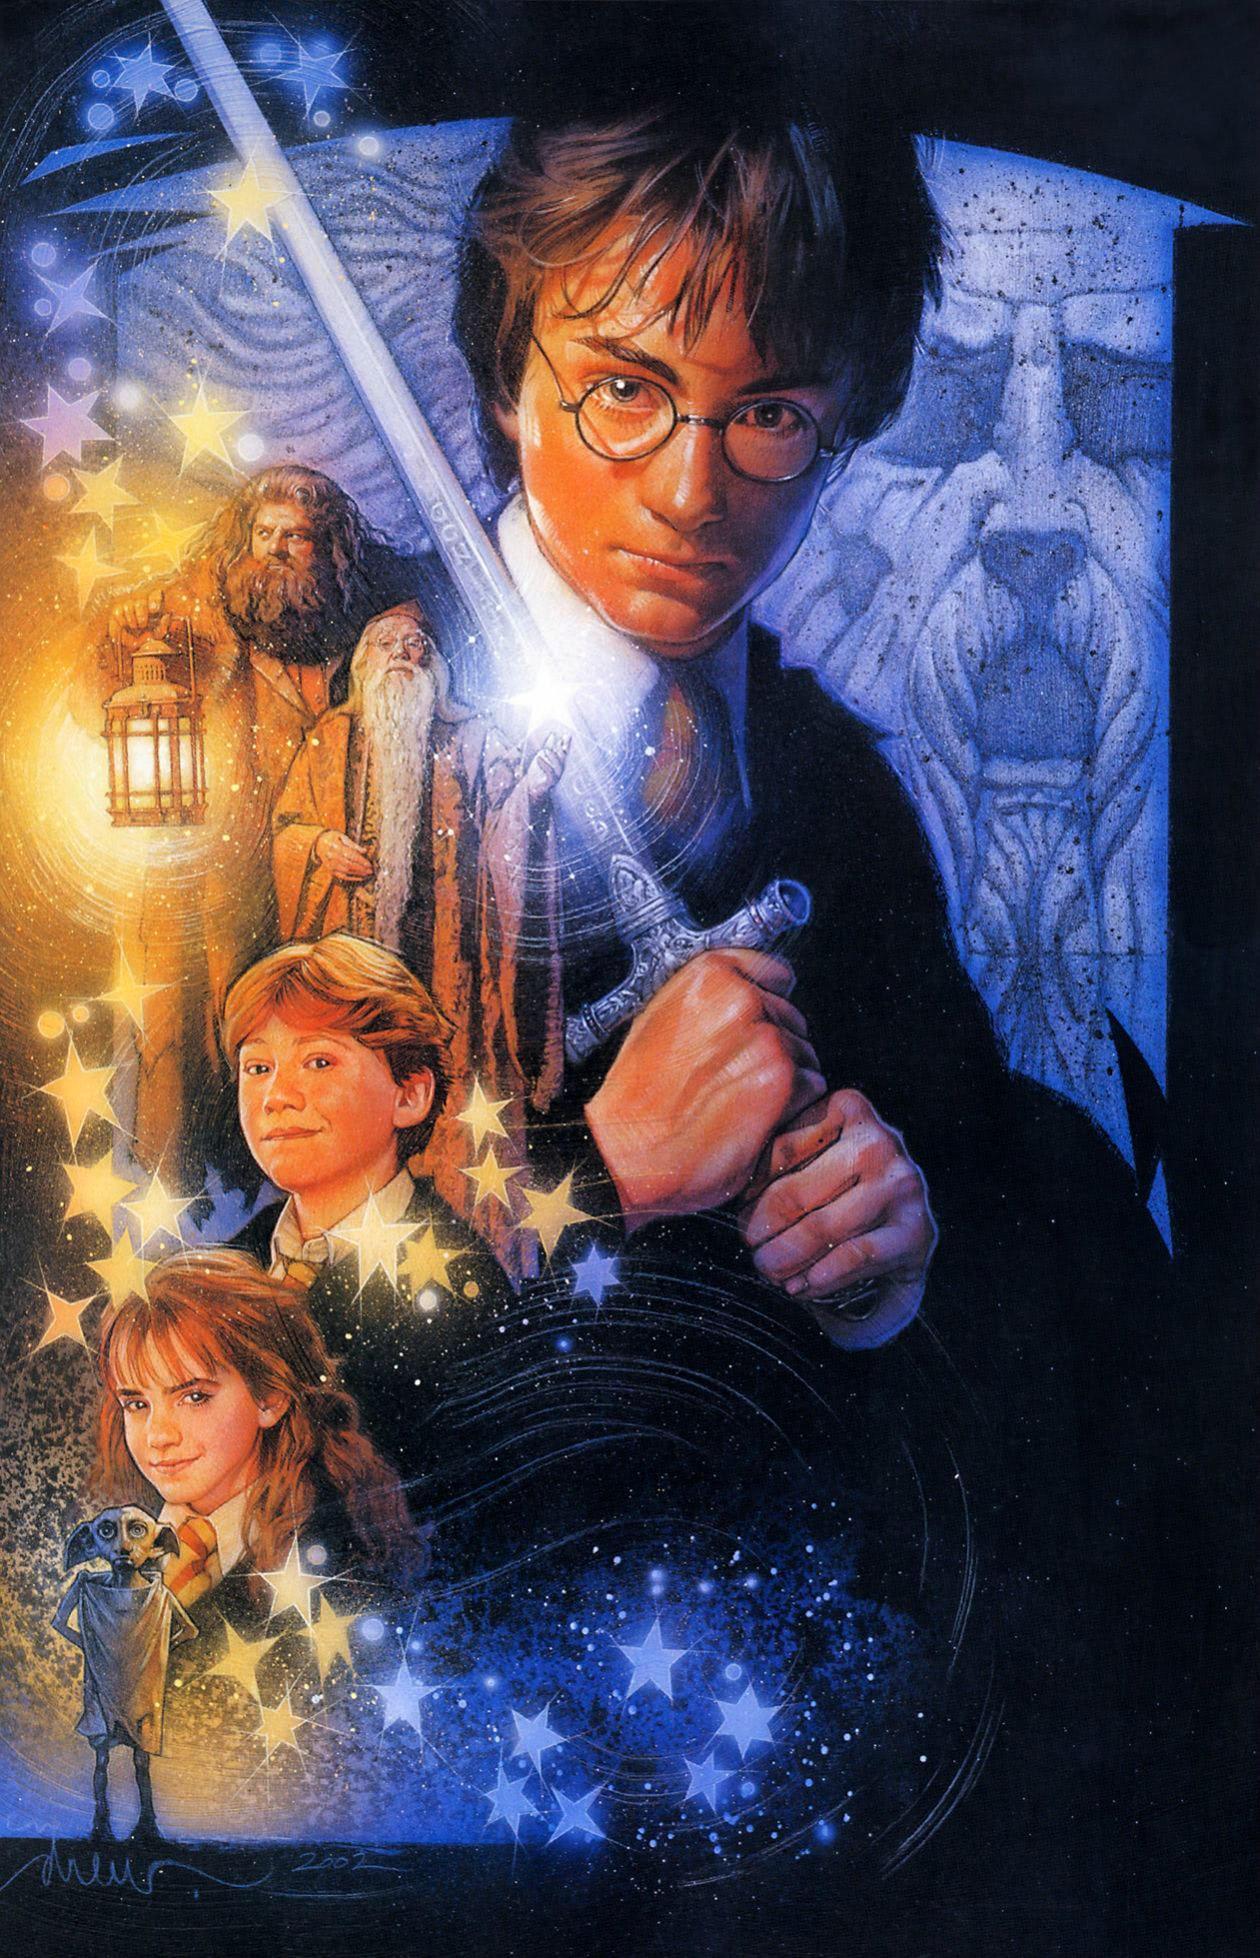 'Chamber of Secrets' (unfinished) Drew Struzan poster